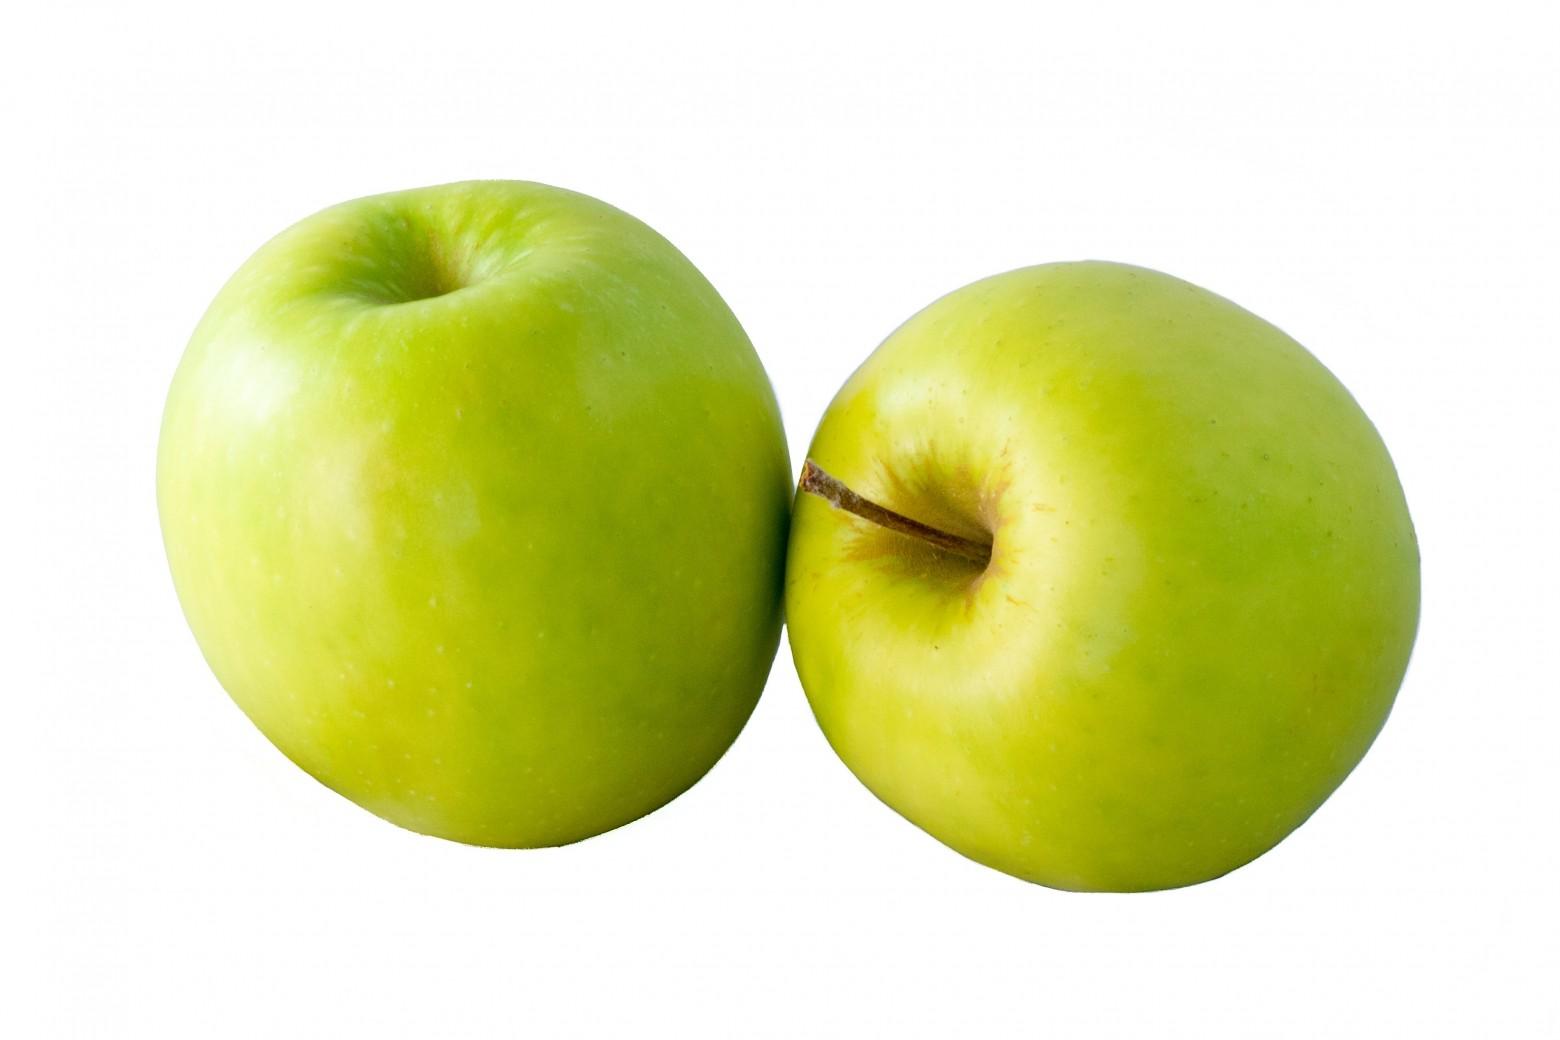 Fond de pomme eva pigford